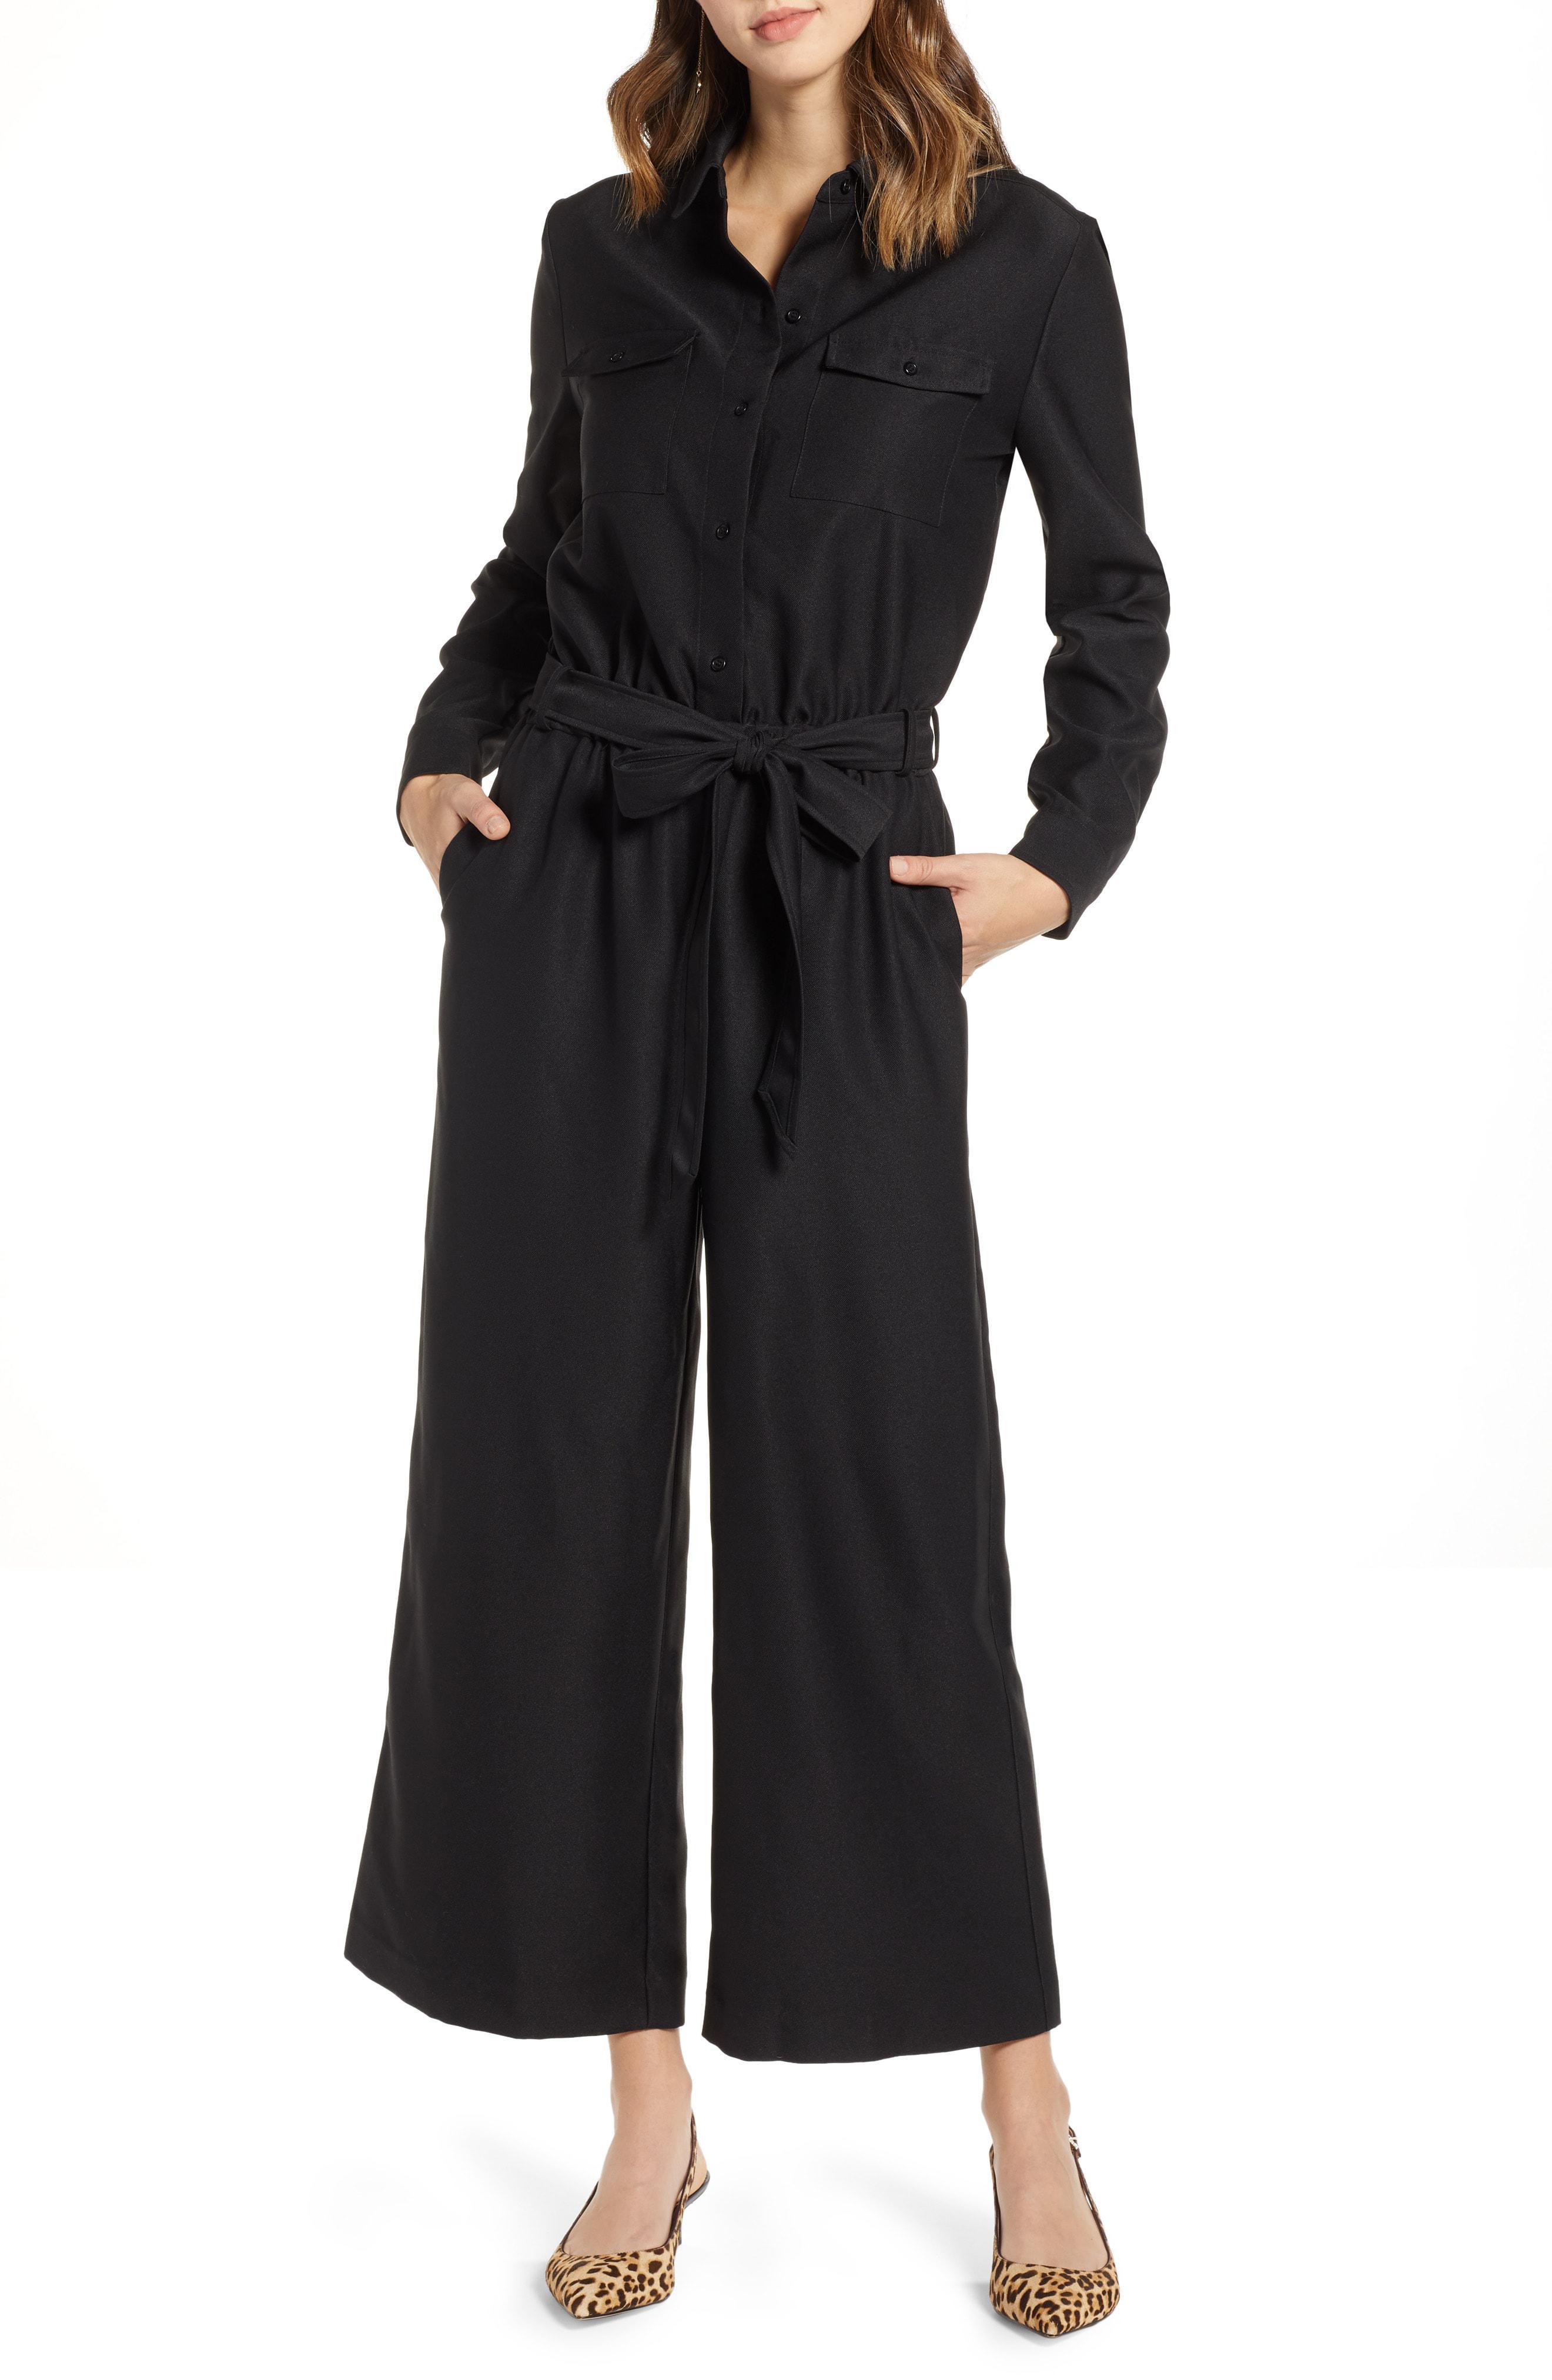 03e871b9b47 Lyst - Nordstrom 1901 Tie Front Jumpsuit in Black